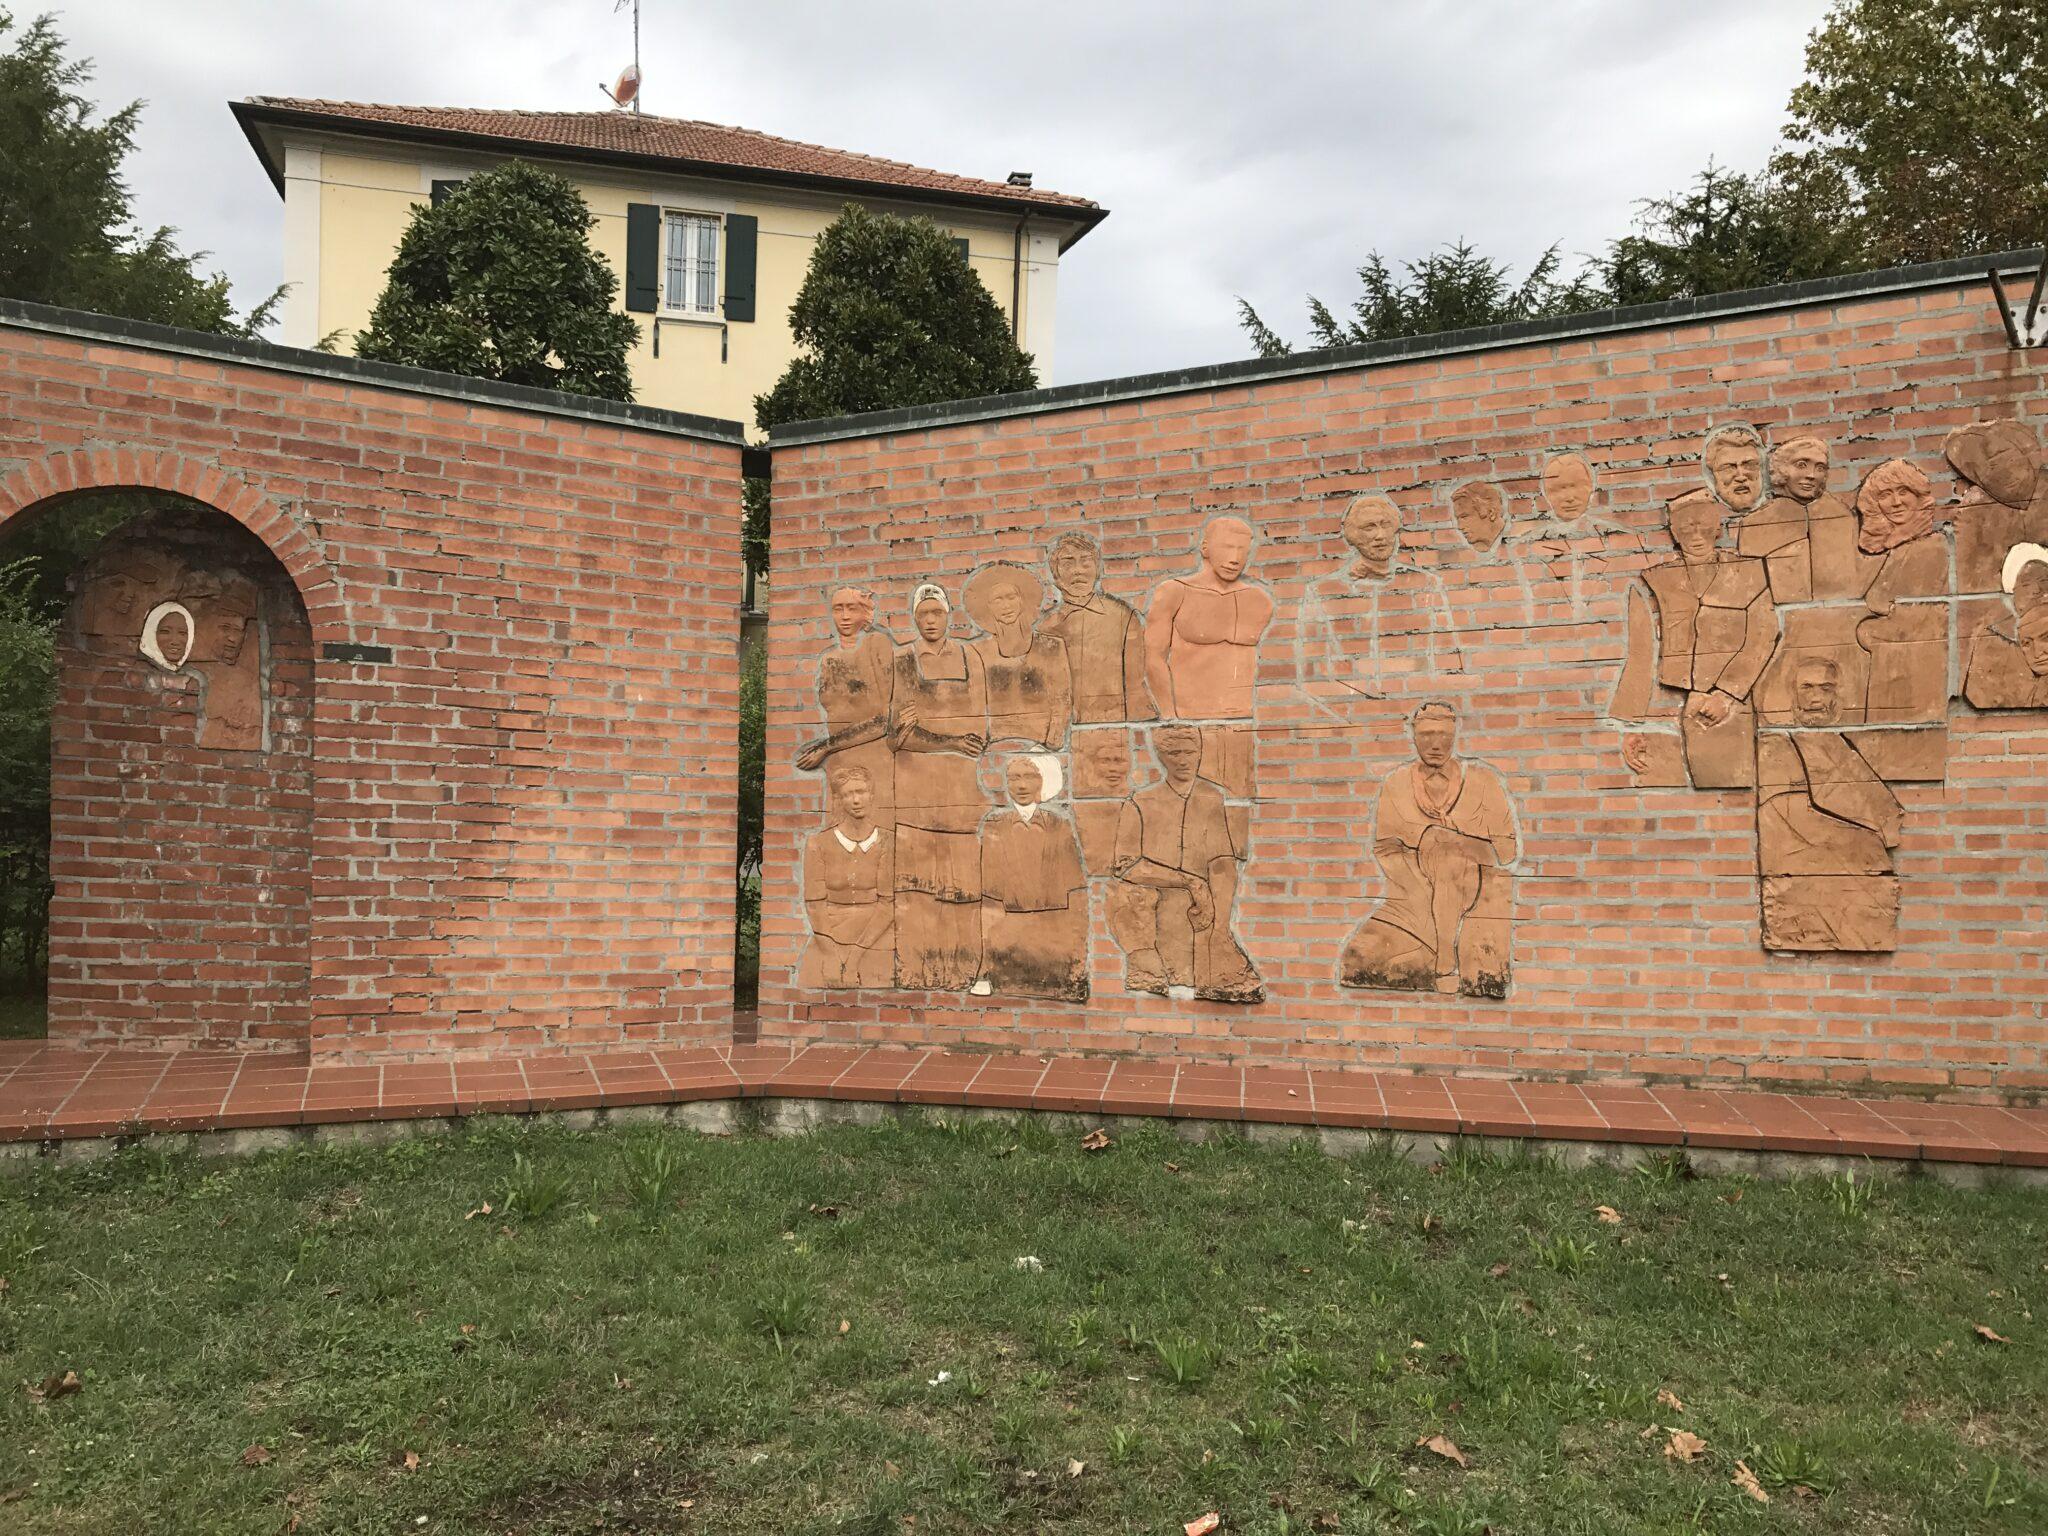 2017 – Bologna and Modena Day 2 – Sant'Agata & San Giovanni P